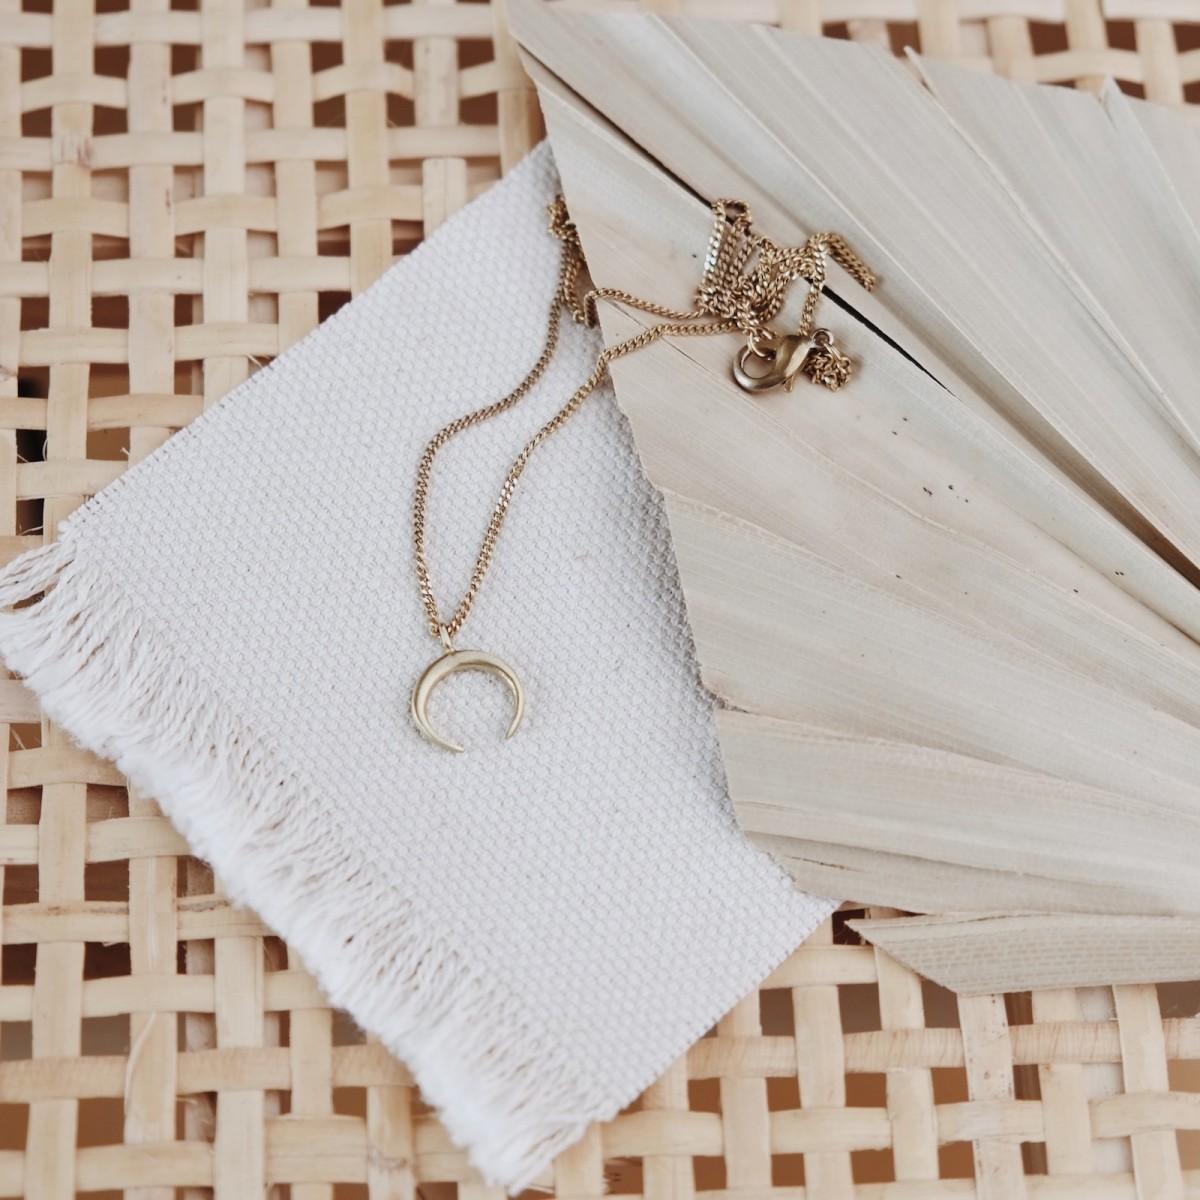 BRASSCAKE // Tiny Moon Necklace